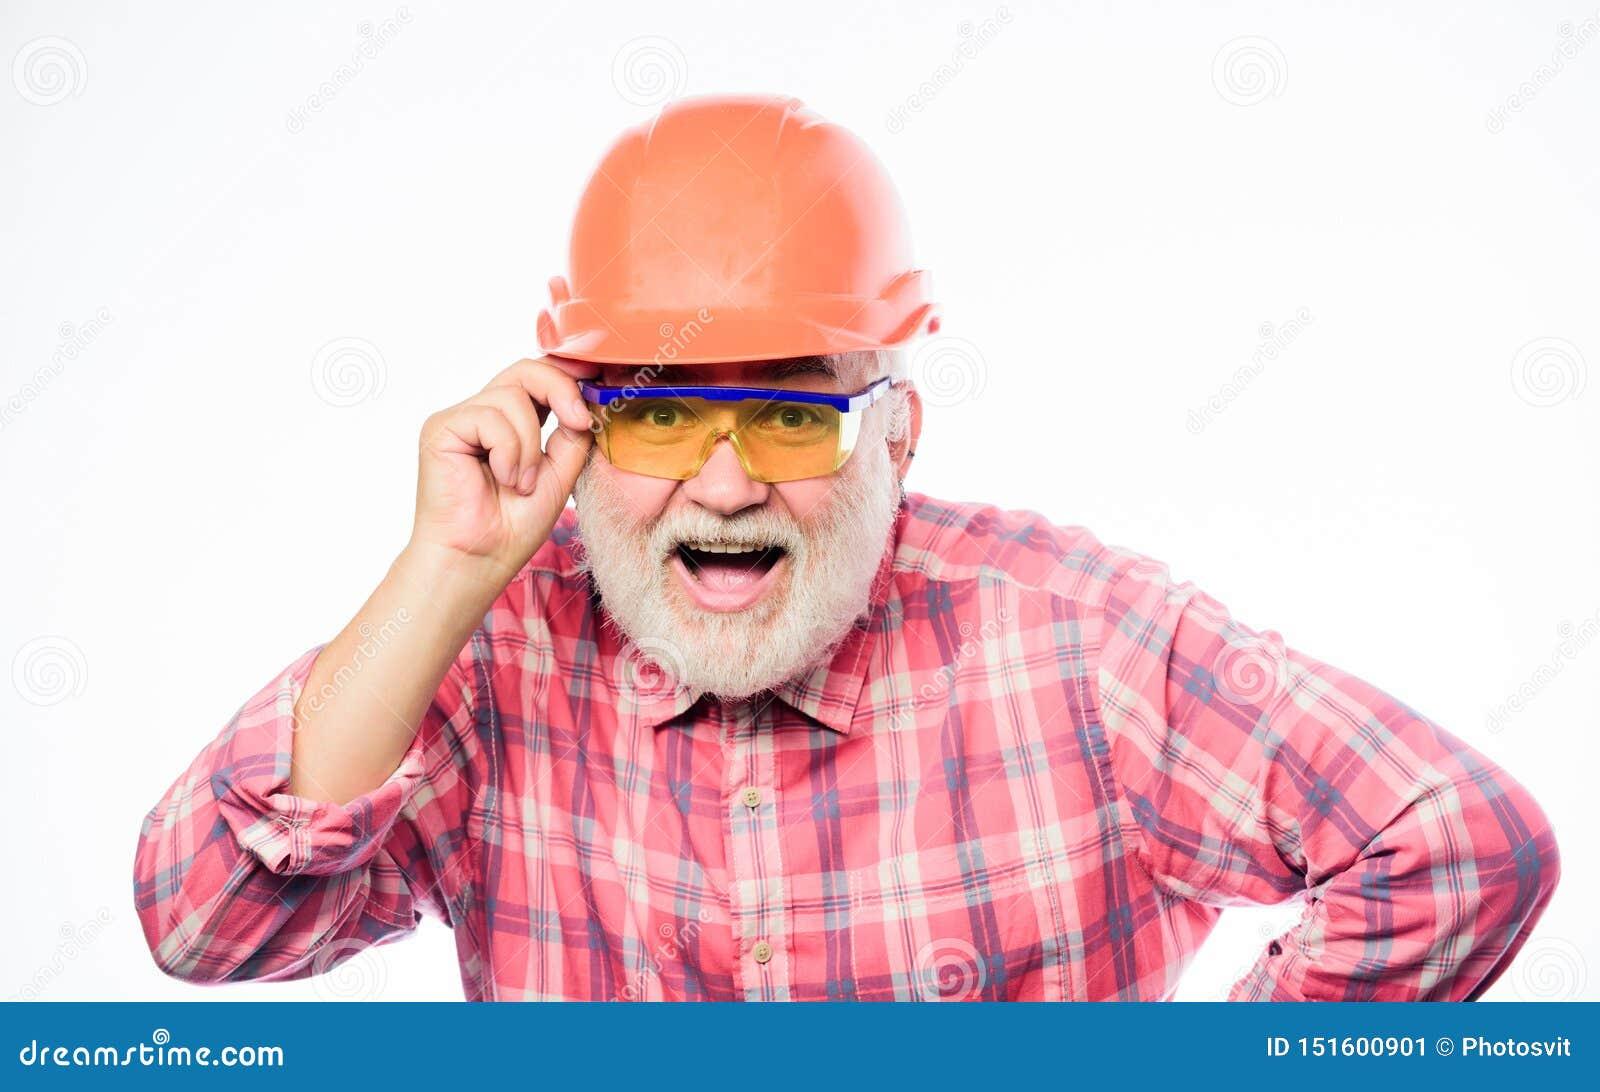 Professional repairman in helmet. architect repair and fix. engineer worker career. mature bearded man in hard hat. man